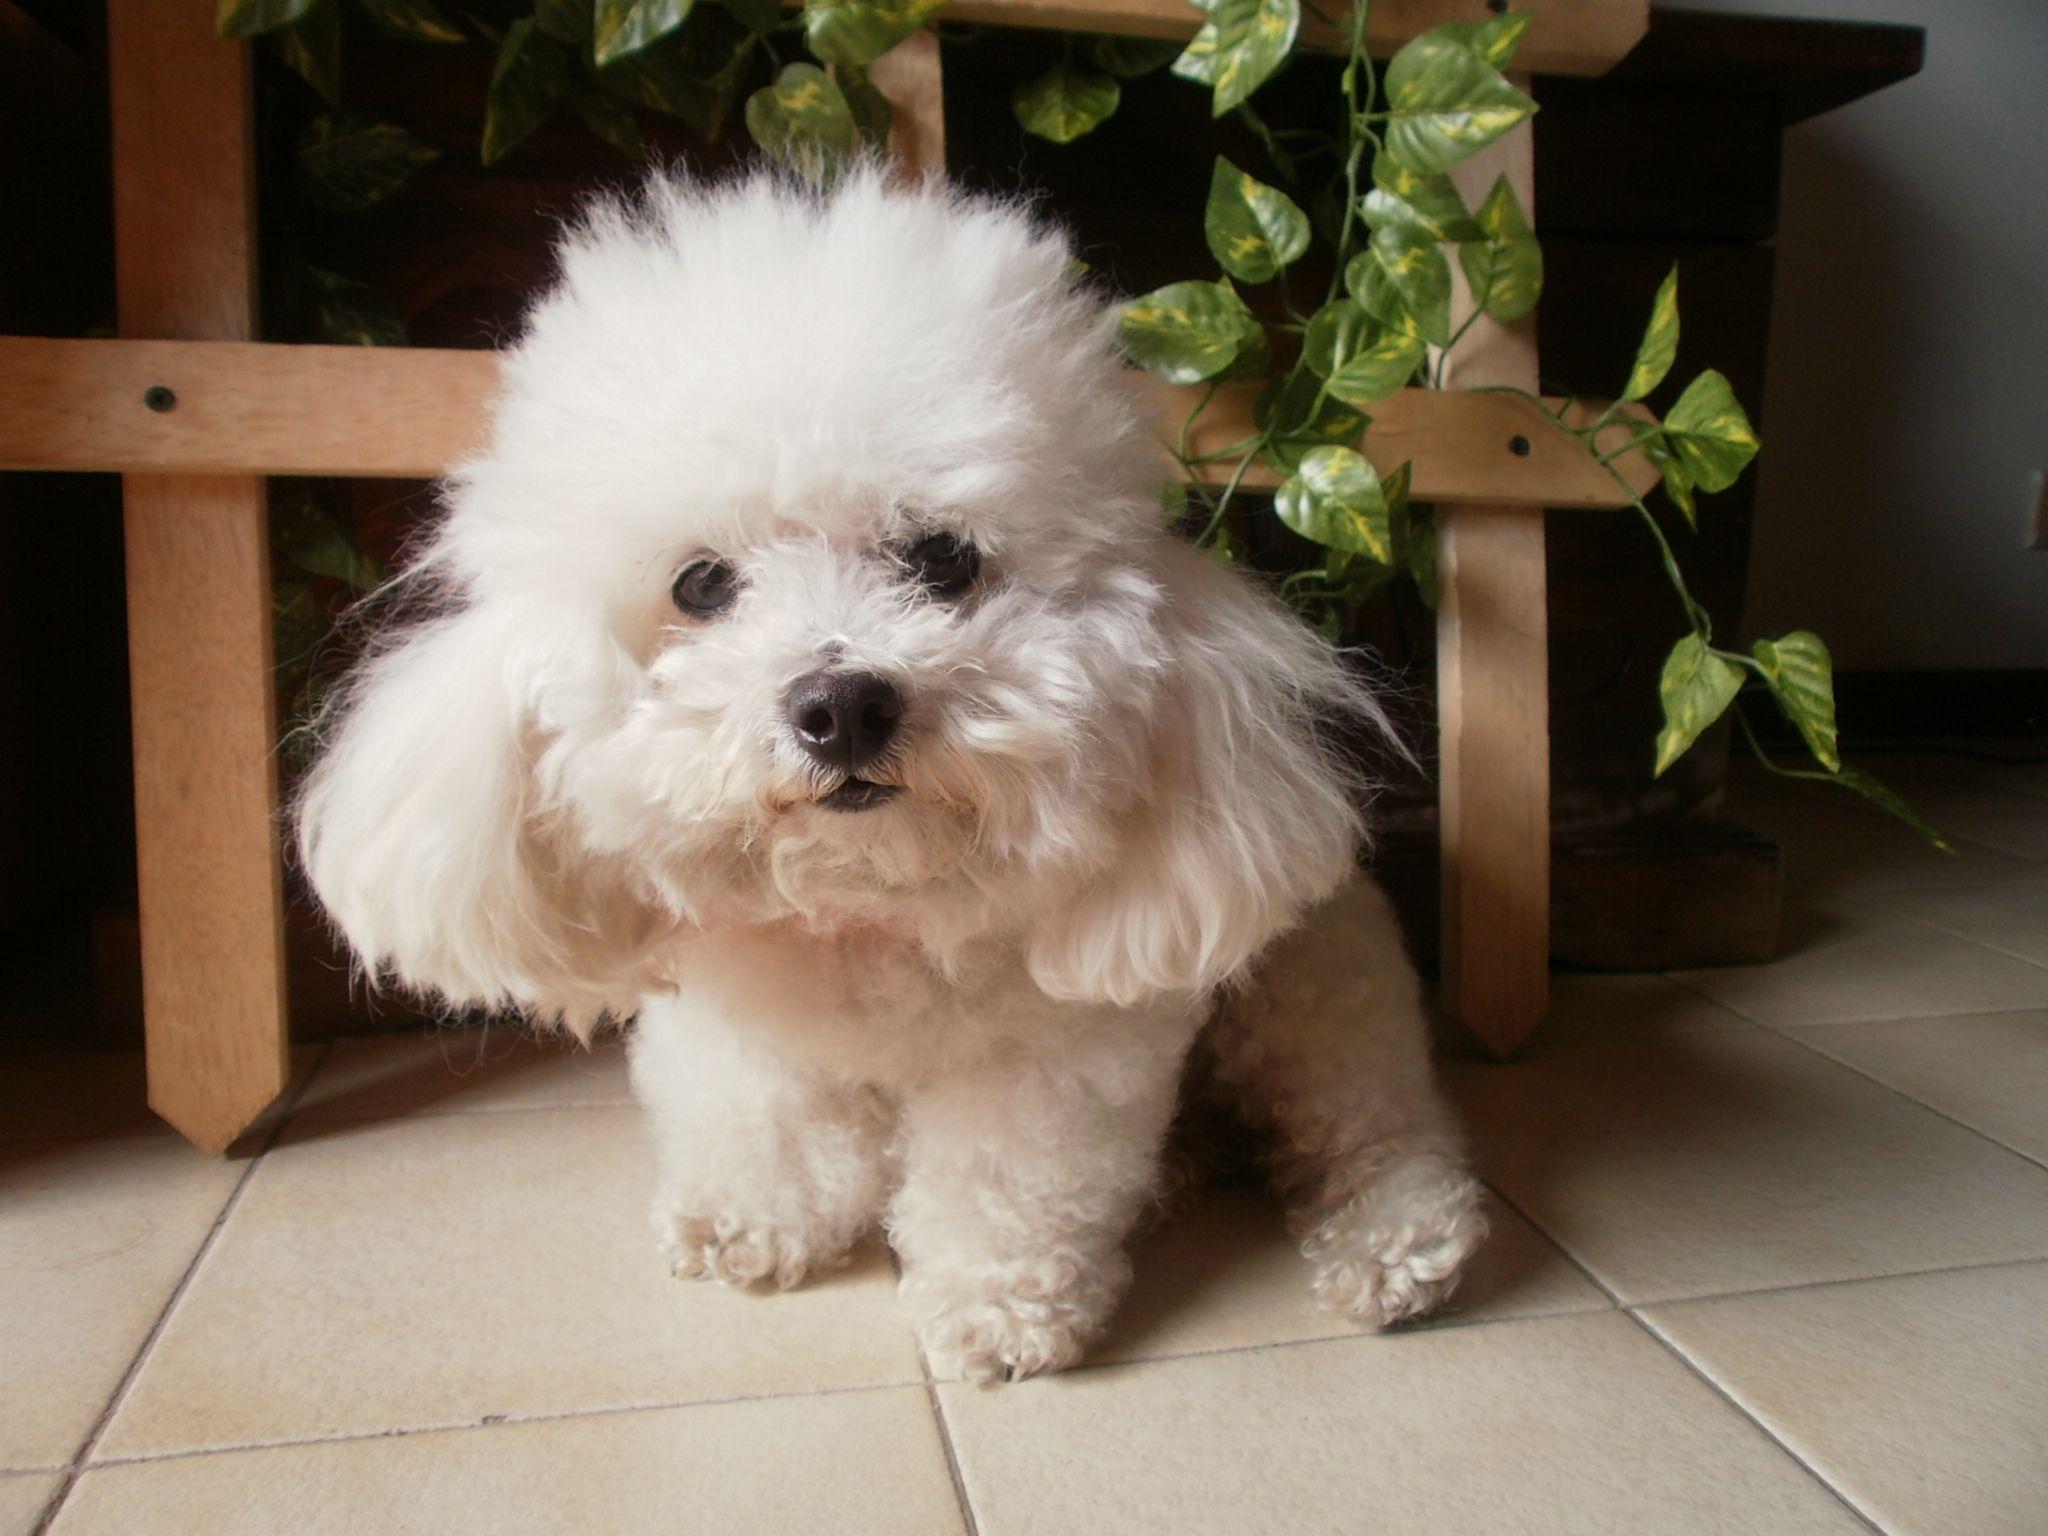 Rambo Perrito De Raza Pequeña French Poodle Tacita De Te Amo